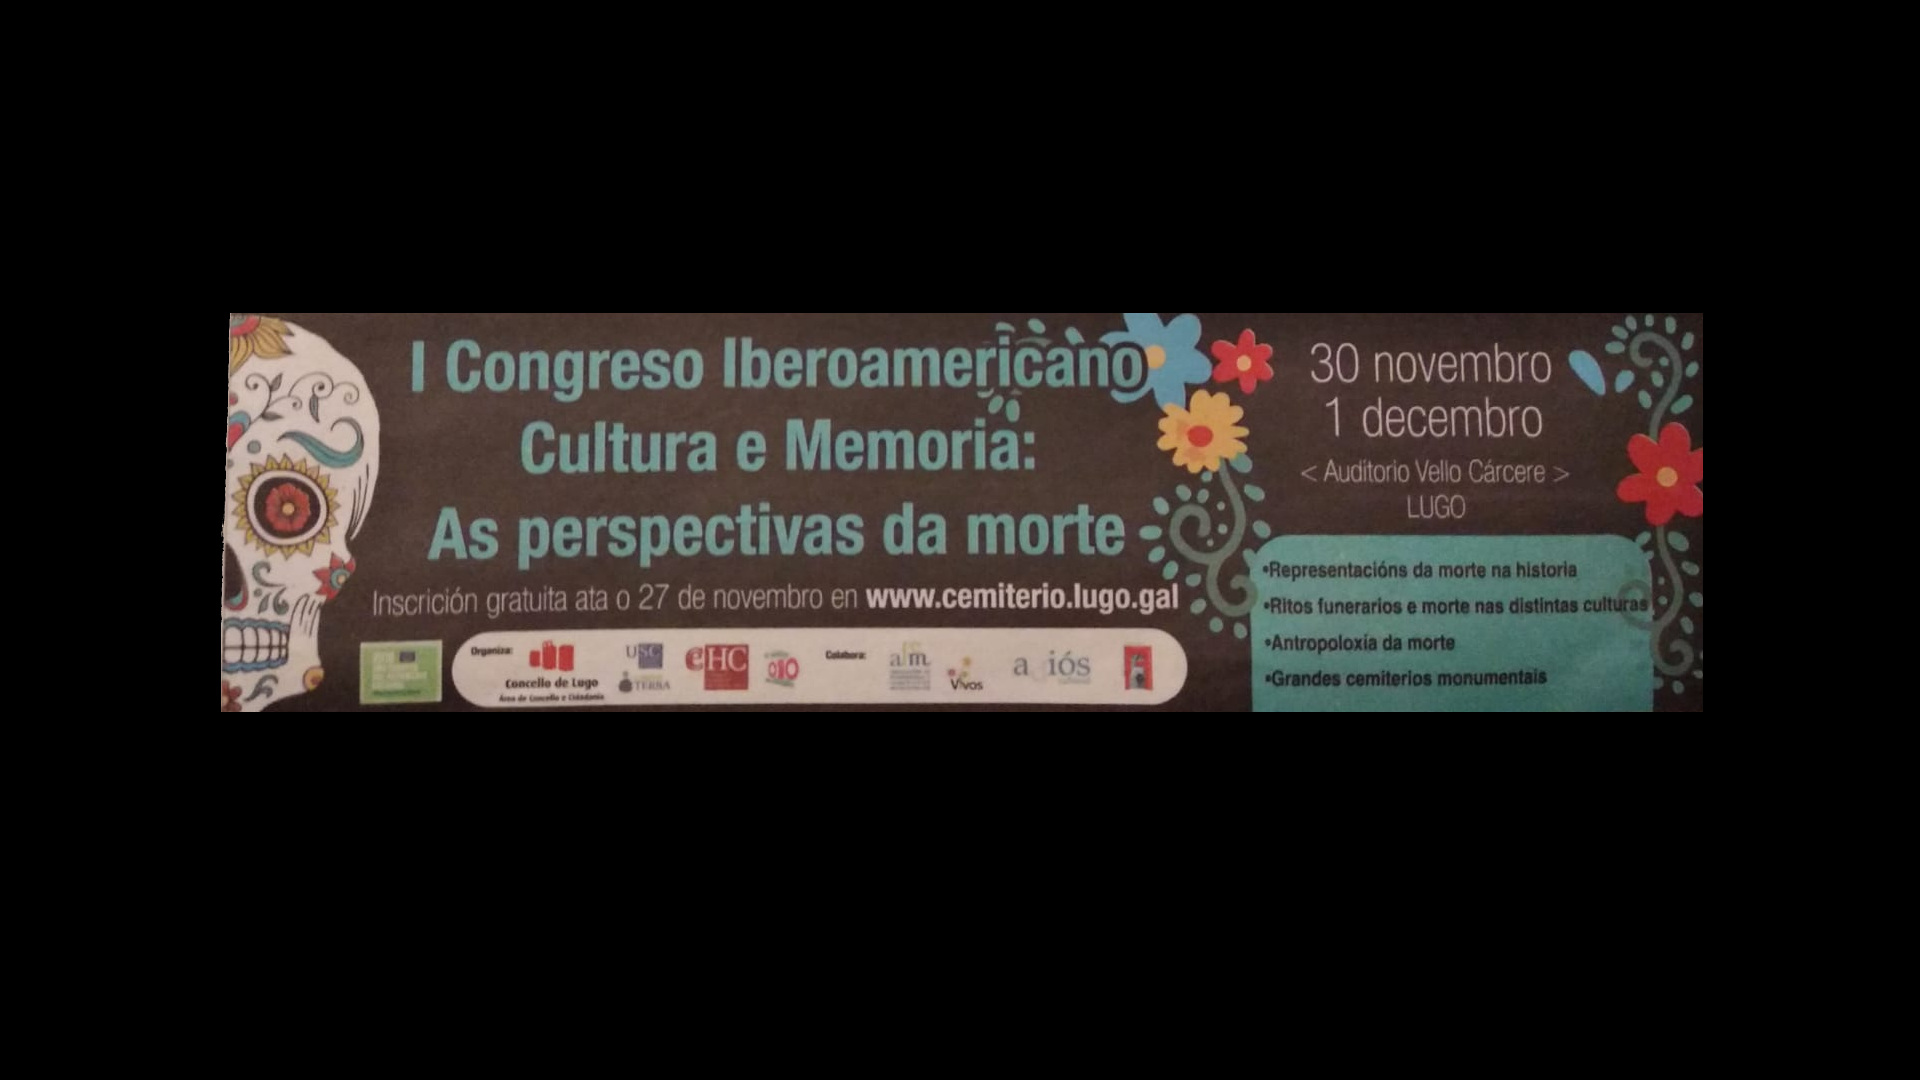 I Congreso Iberoamericano...